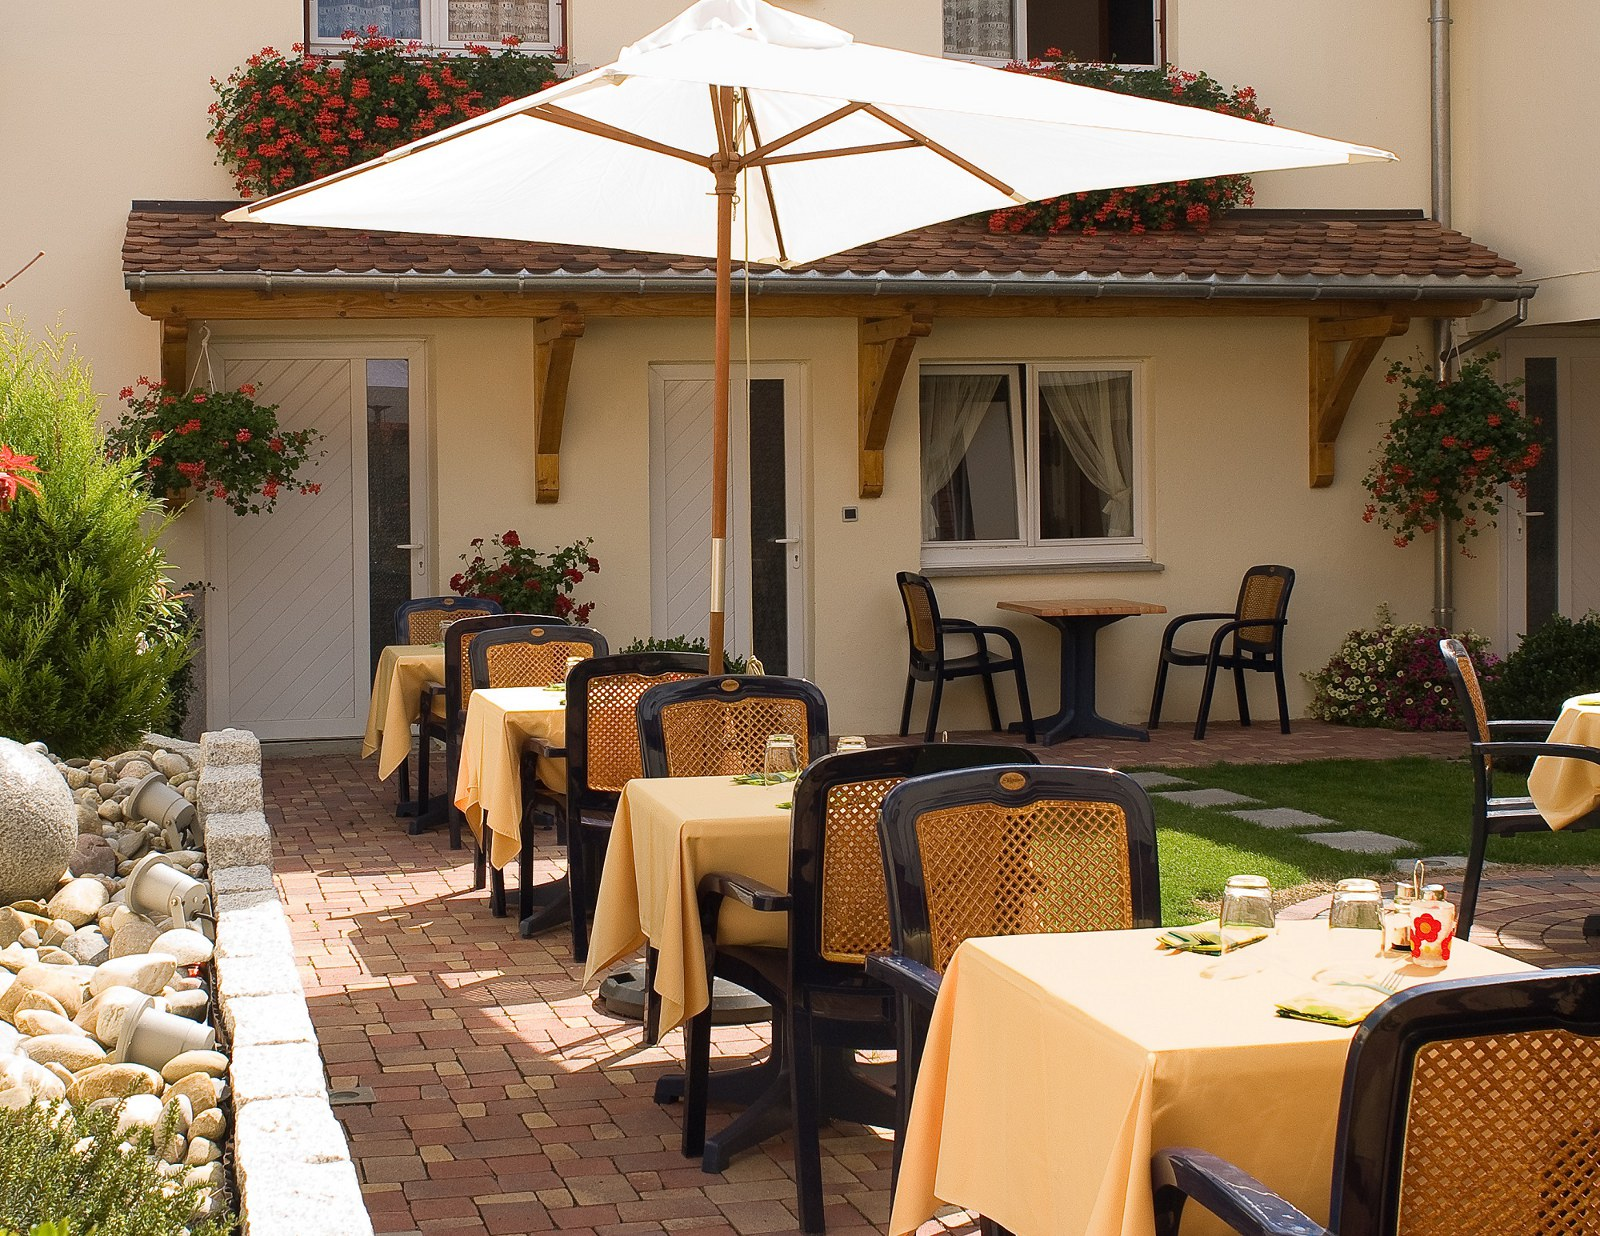 Hôtel-restaurant Spa Au Soleil